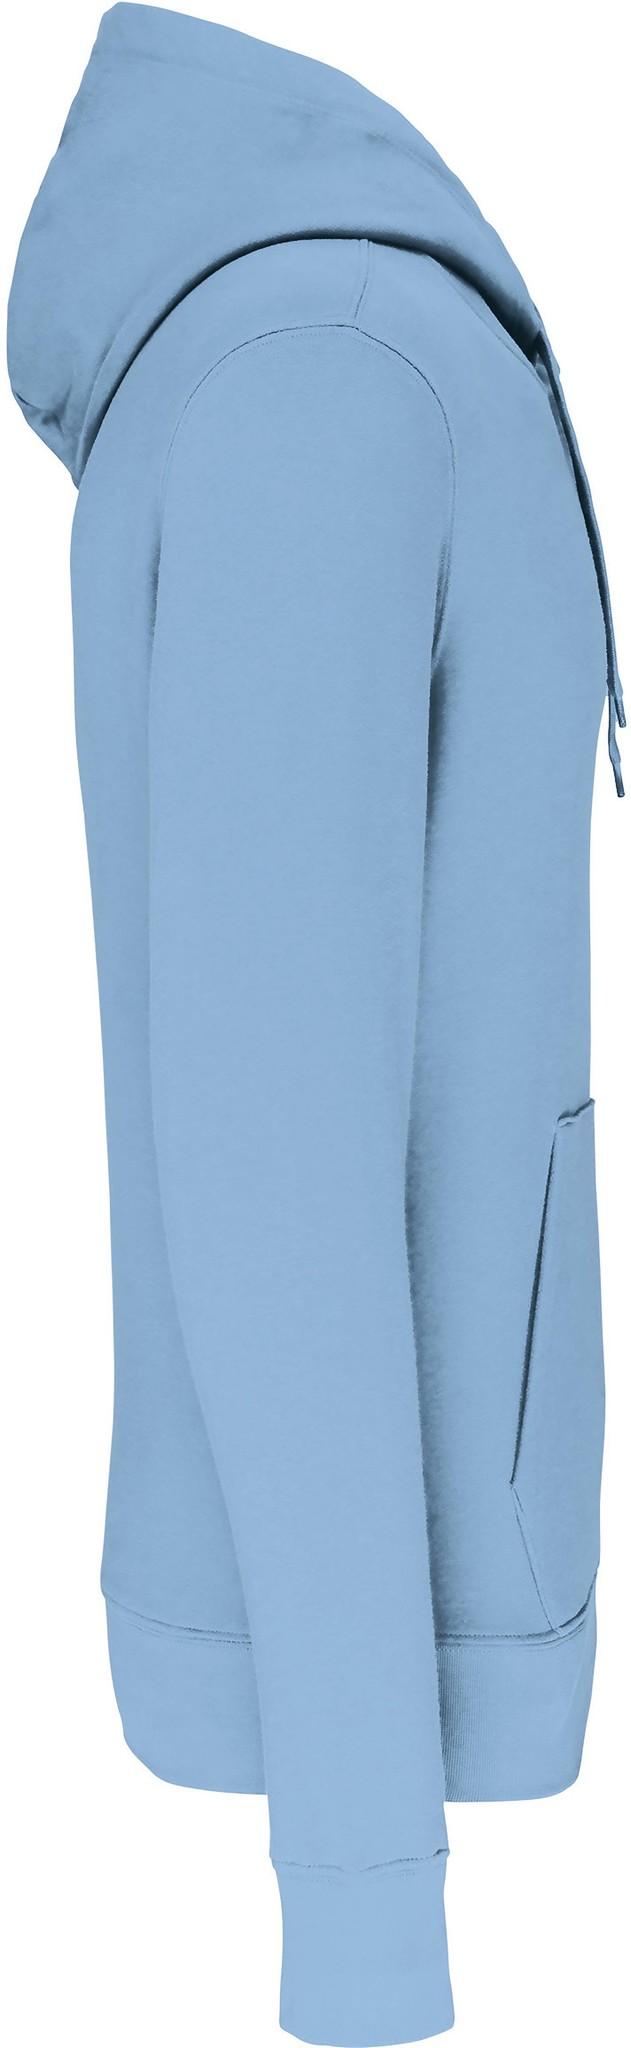 Eco-Friendly Hoodie Uni Sky-Blue